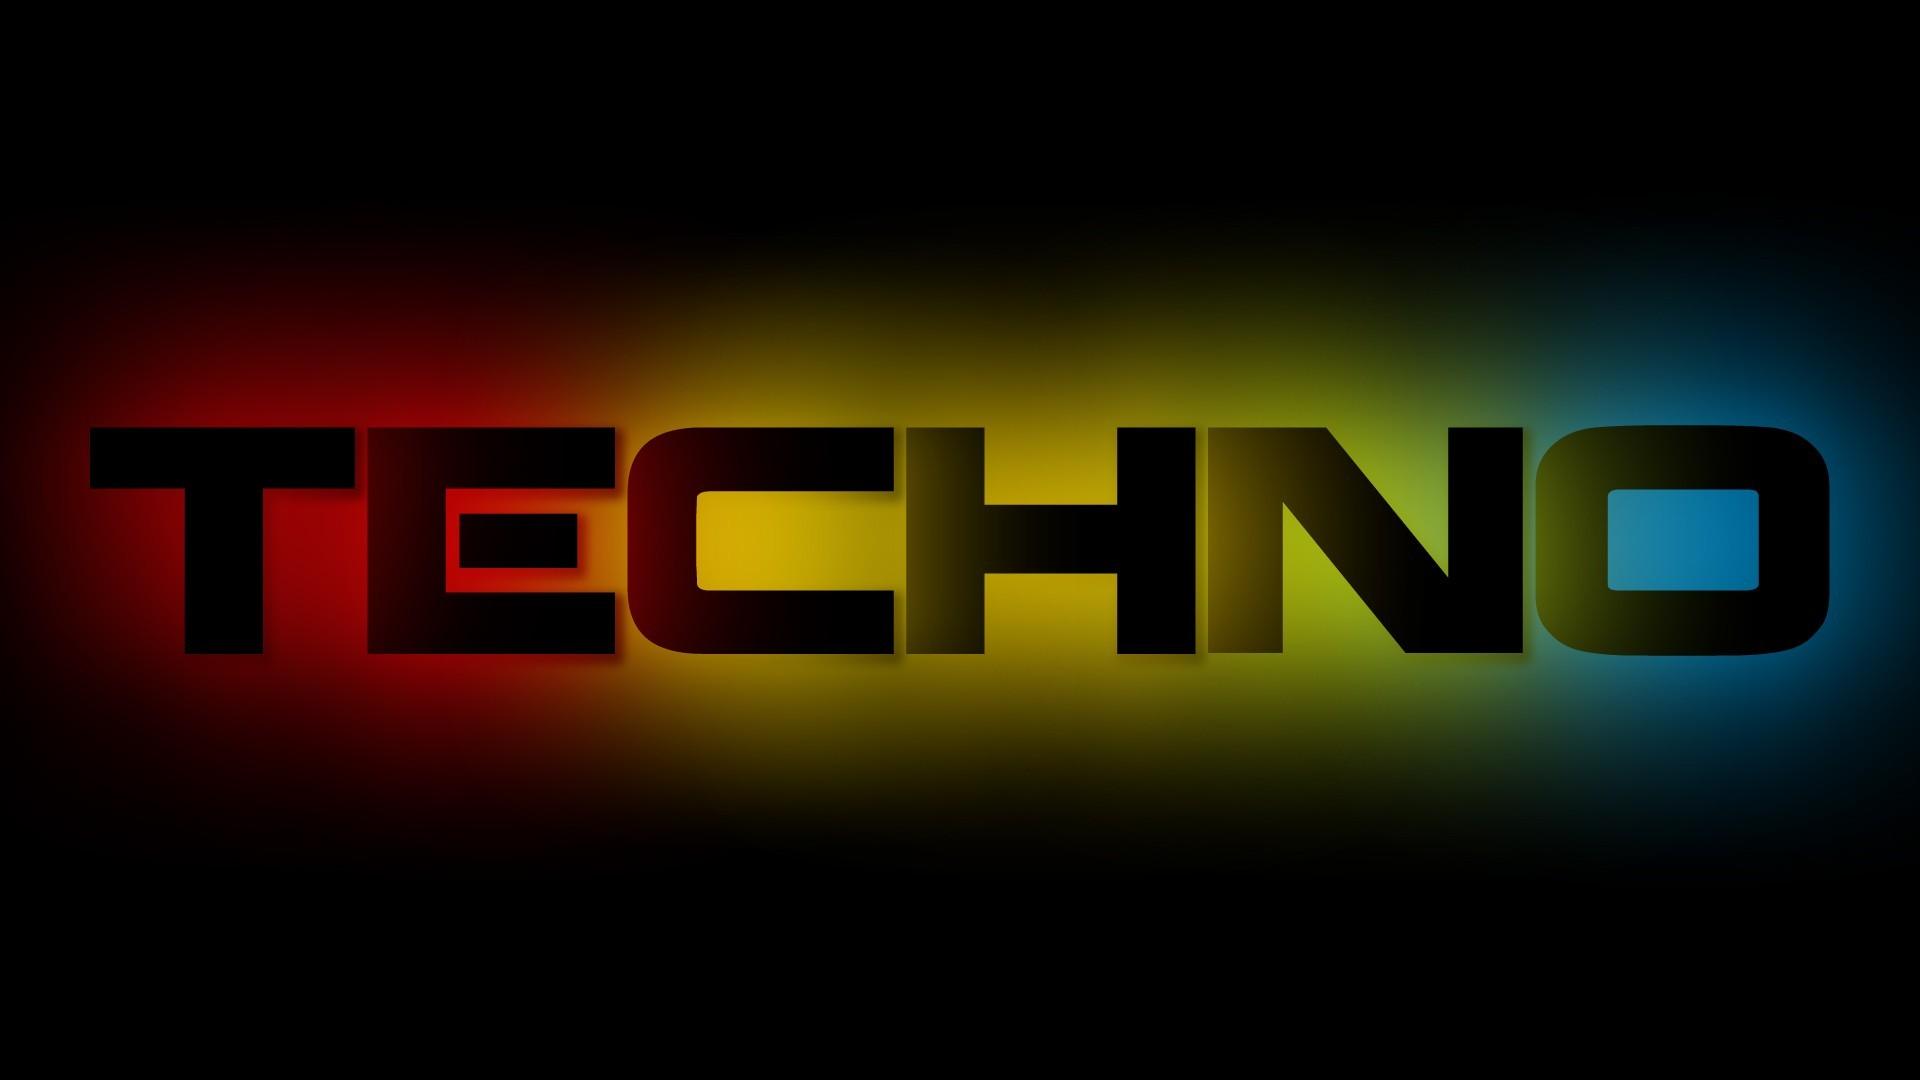 72+] Techno Music Wallpaper on WallpaperSafari